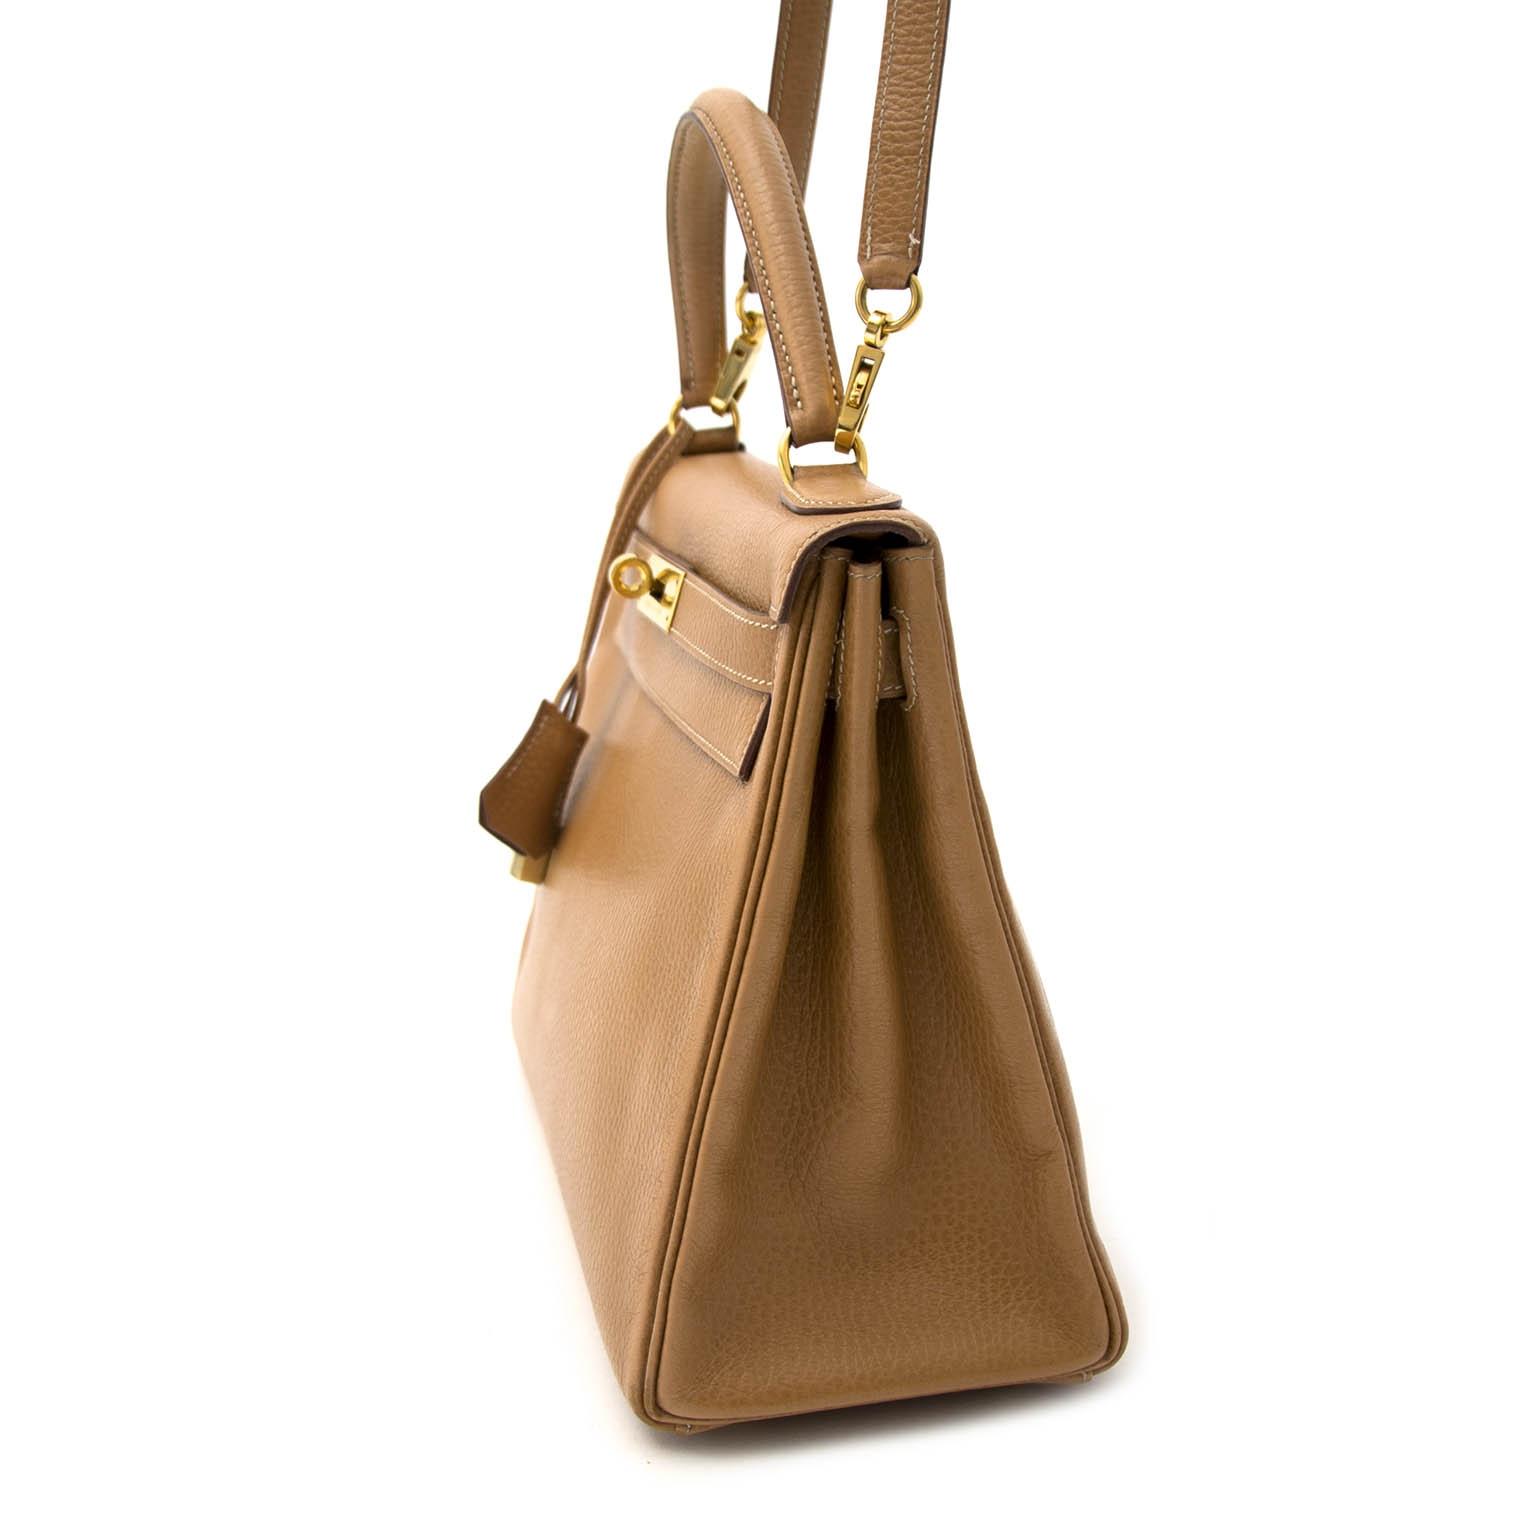 afc853148fd78 ... acheter en ligne seconde main Hermès Caramel Kelly 28 Fache Liegee GHW